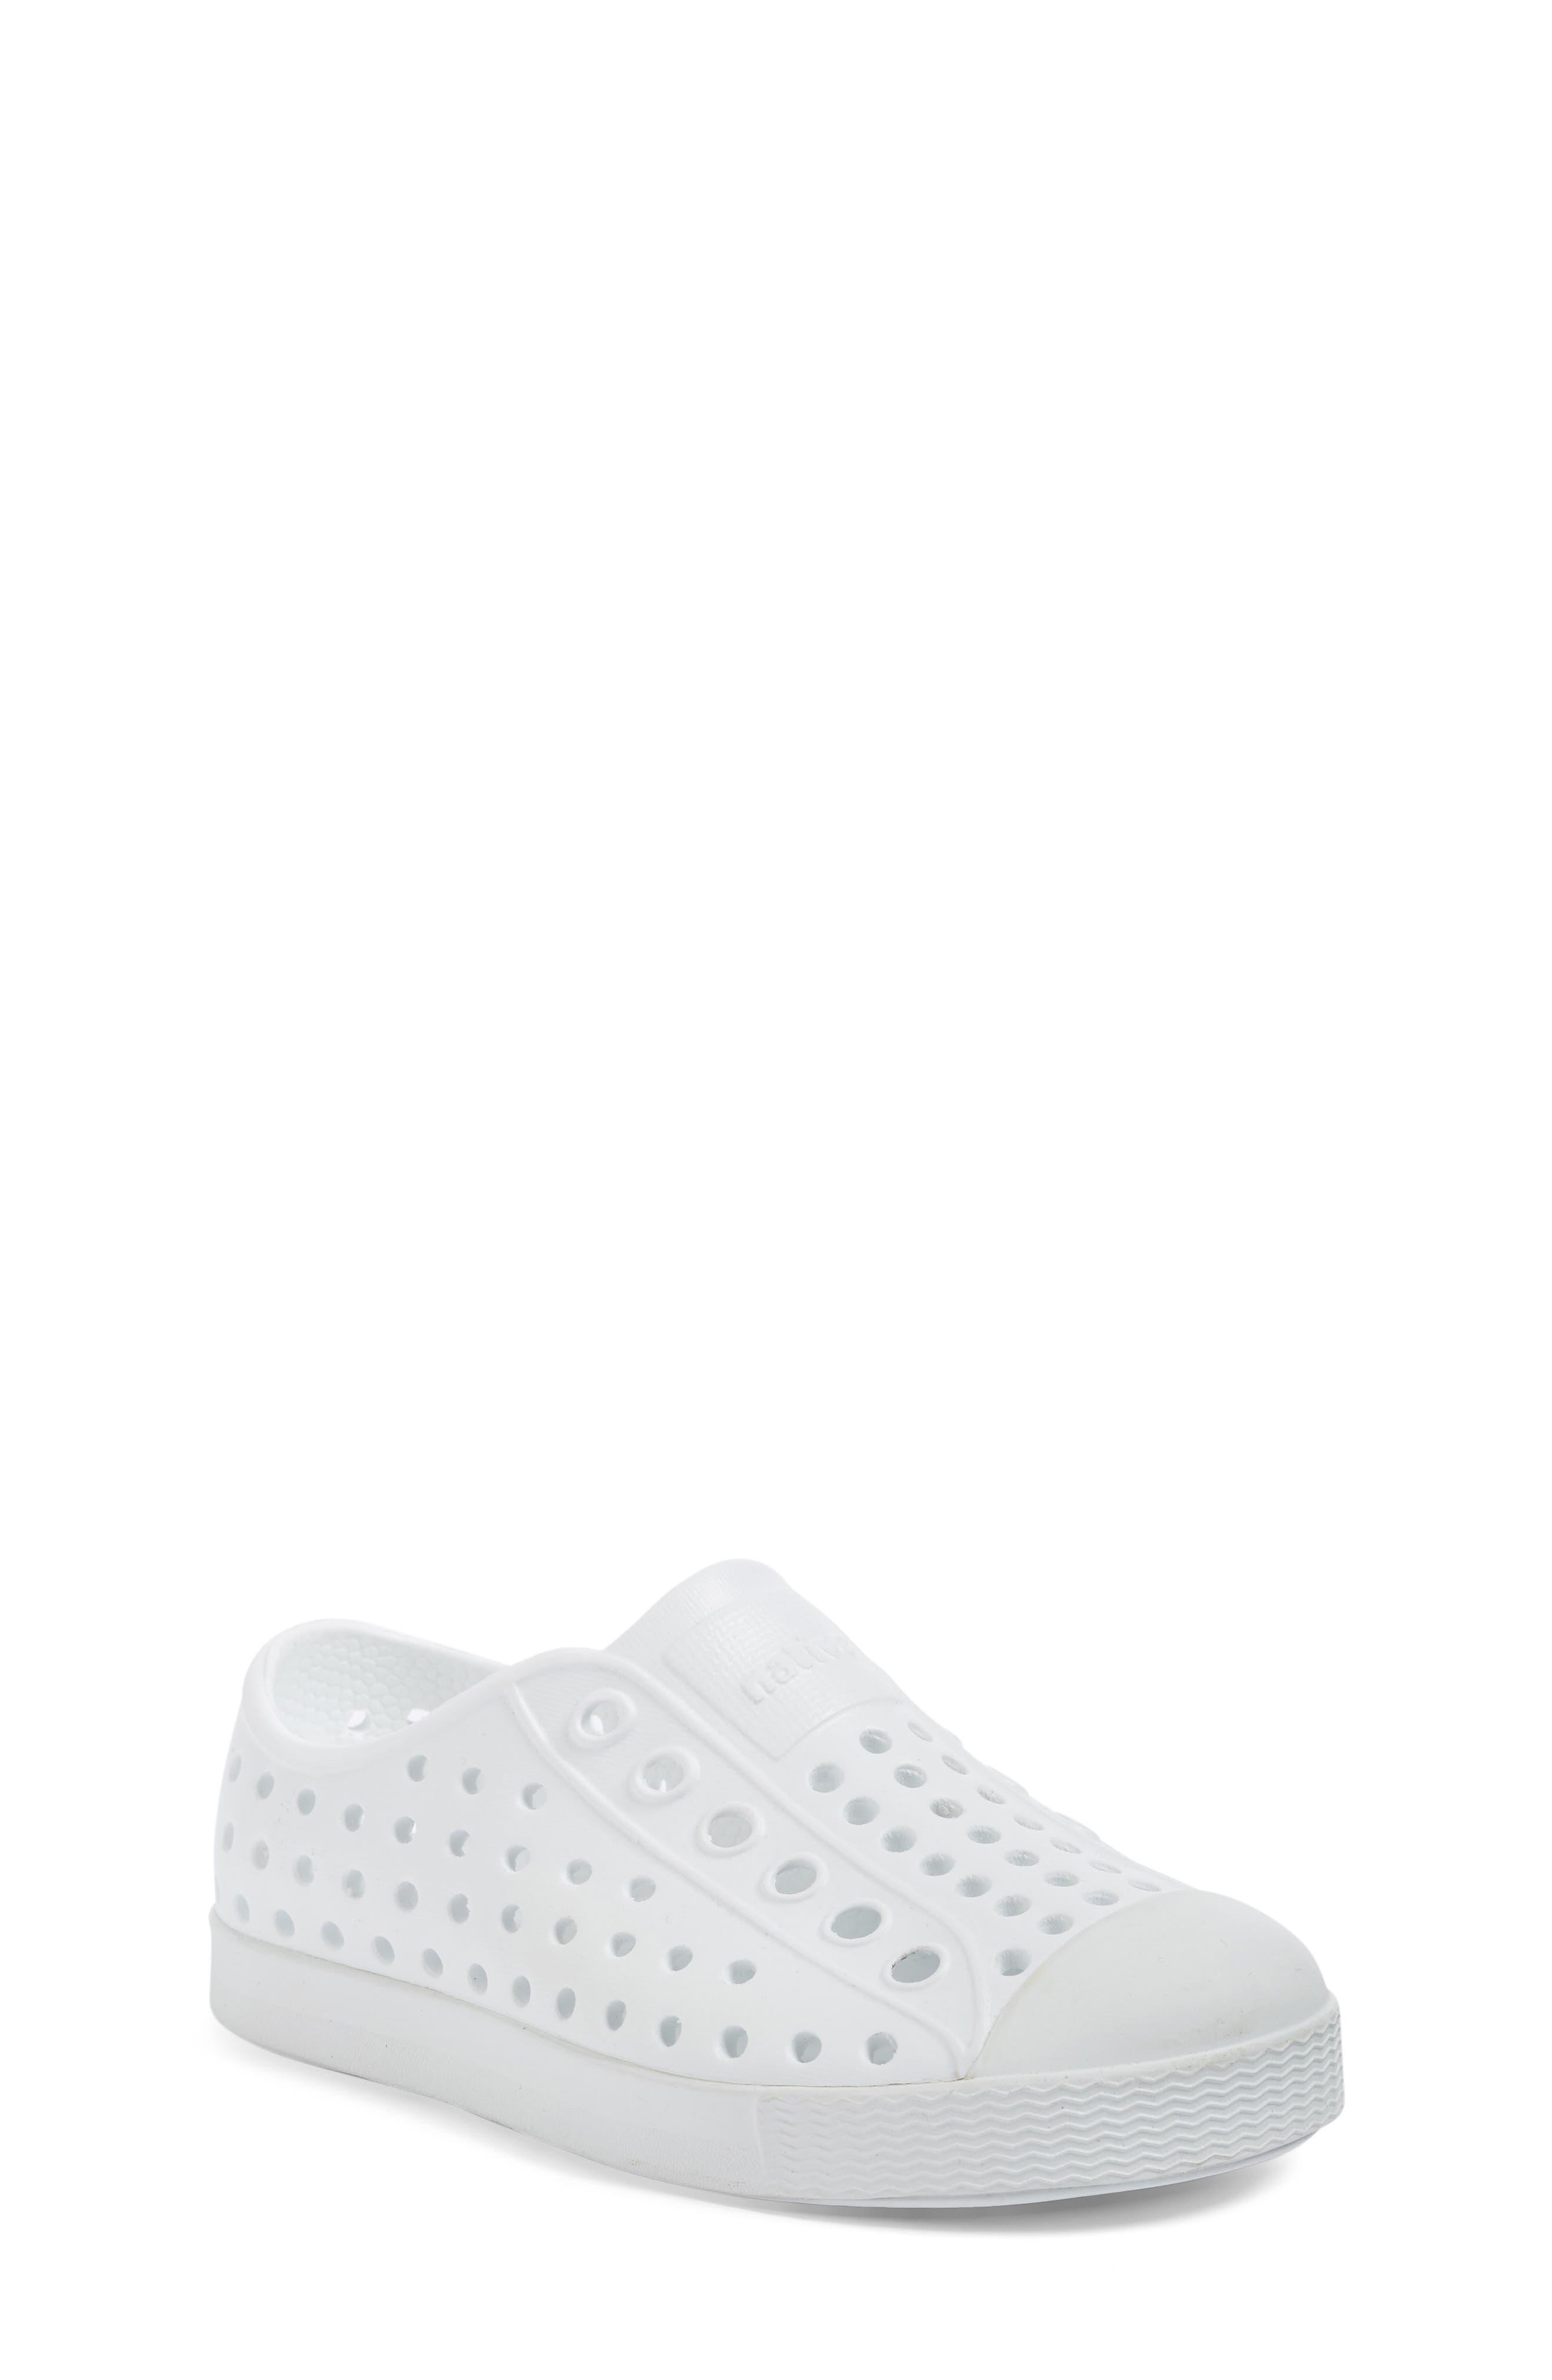 'Jefferson' Water Friendly Slip-On Sneaker,                             Main thumbnail 36, color,